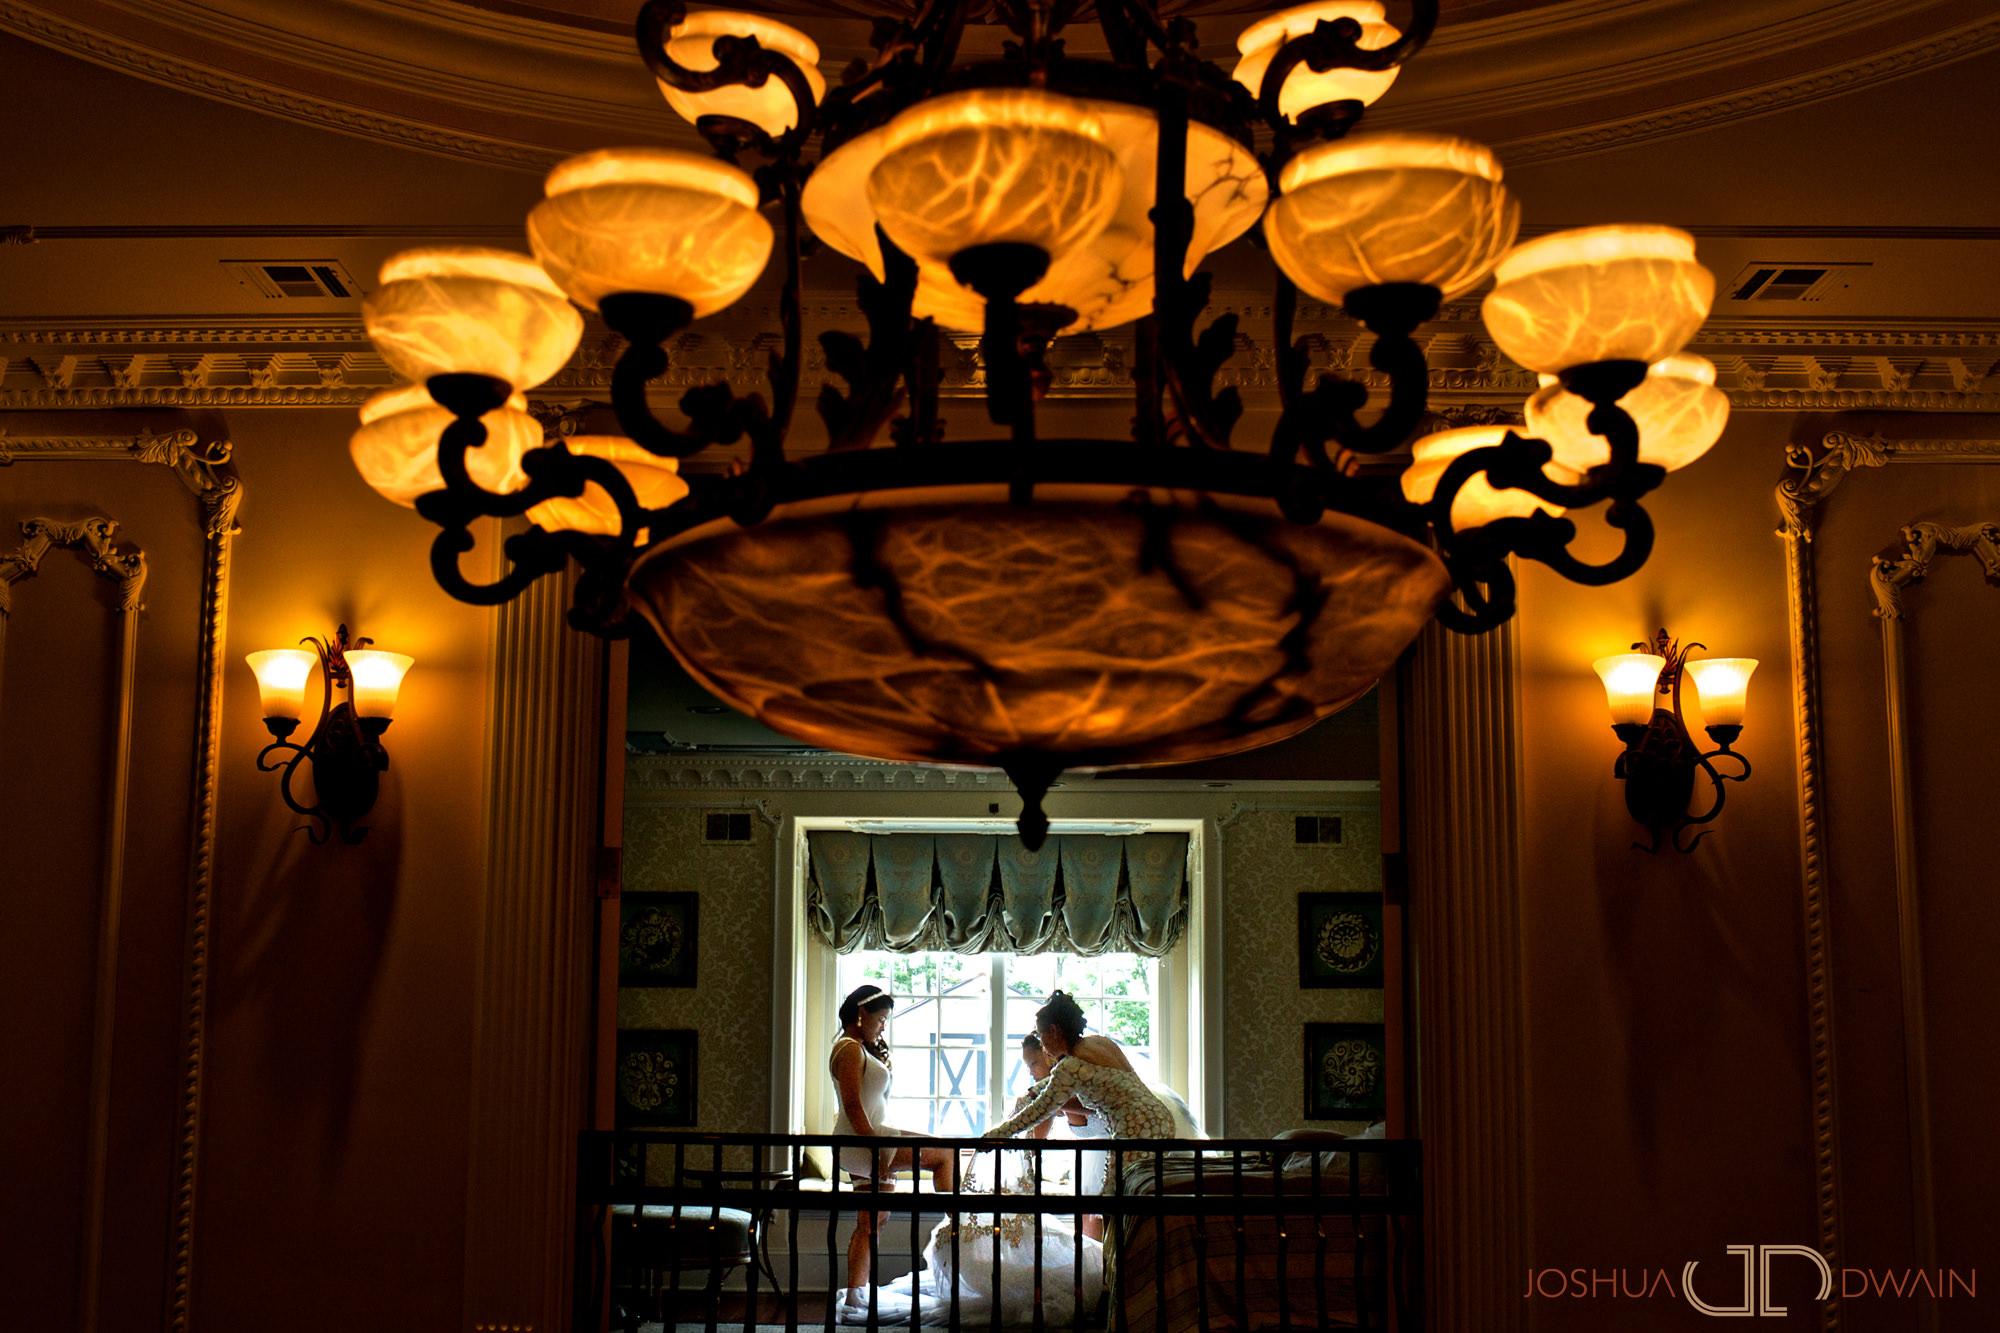 cadisha-antoine-007-ashford-estates-allentown-nj-wedding-photographer-joshua-dwain-photography-